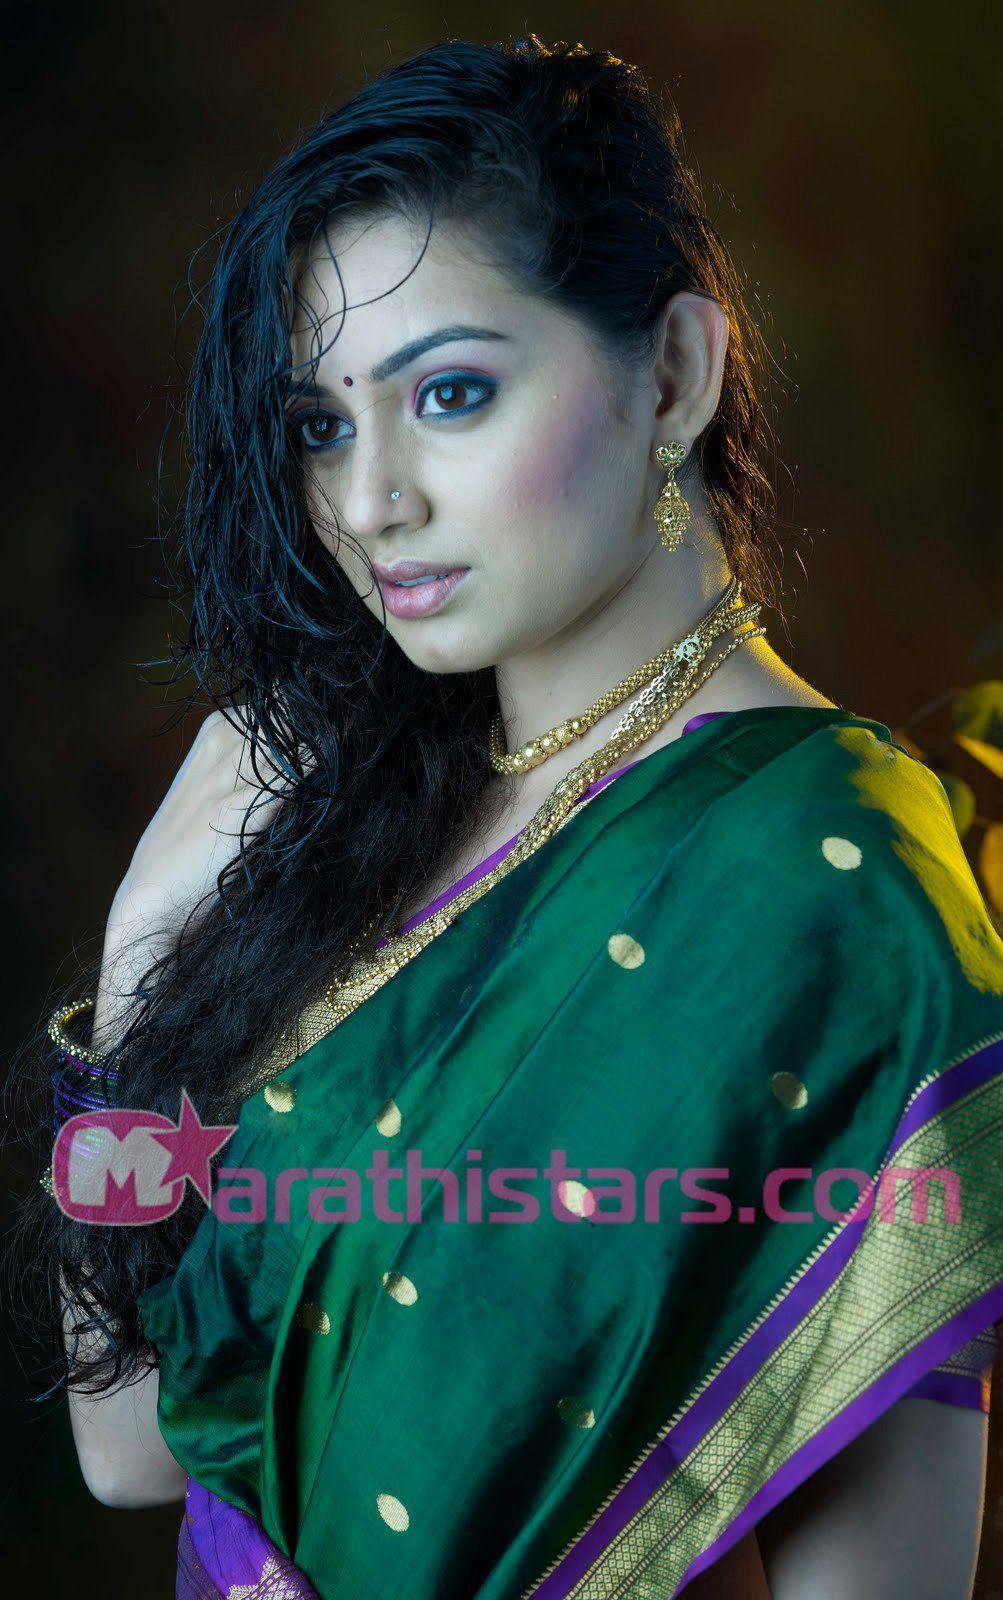 Rupali bhosle marathi actress wallpaper marathi actress best rupali bhosle marathi actress wallpaper marathi actress thecheapjerseys Choice Image